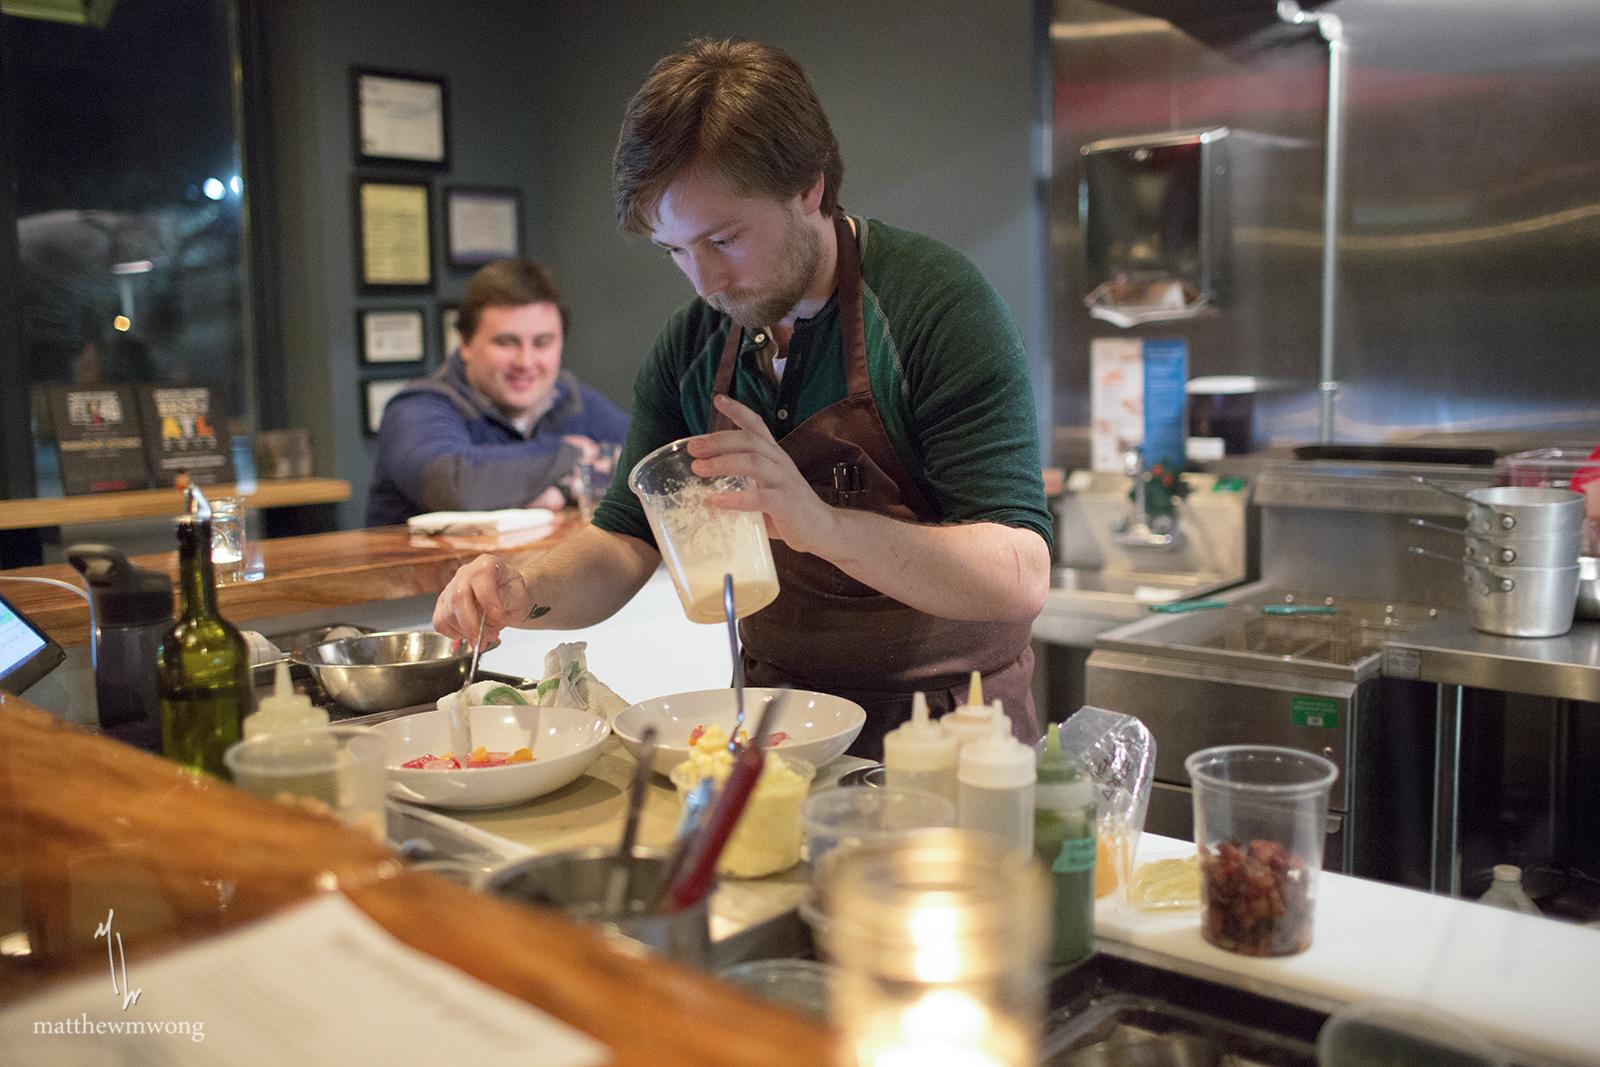 Chef Jonathan Miller finishing up the Yellowfin crudo.